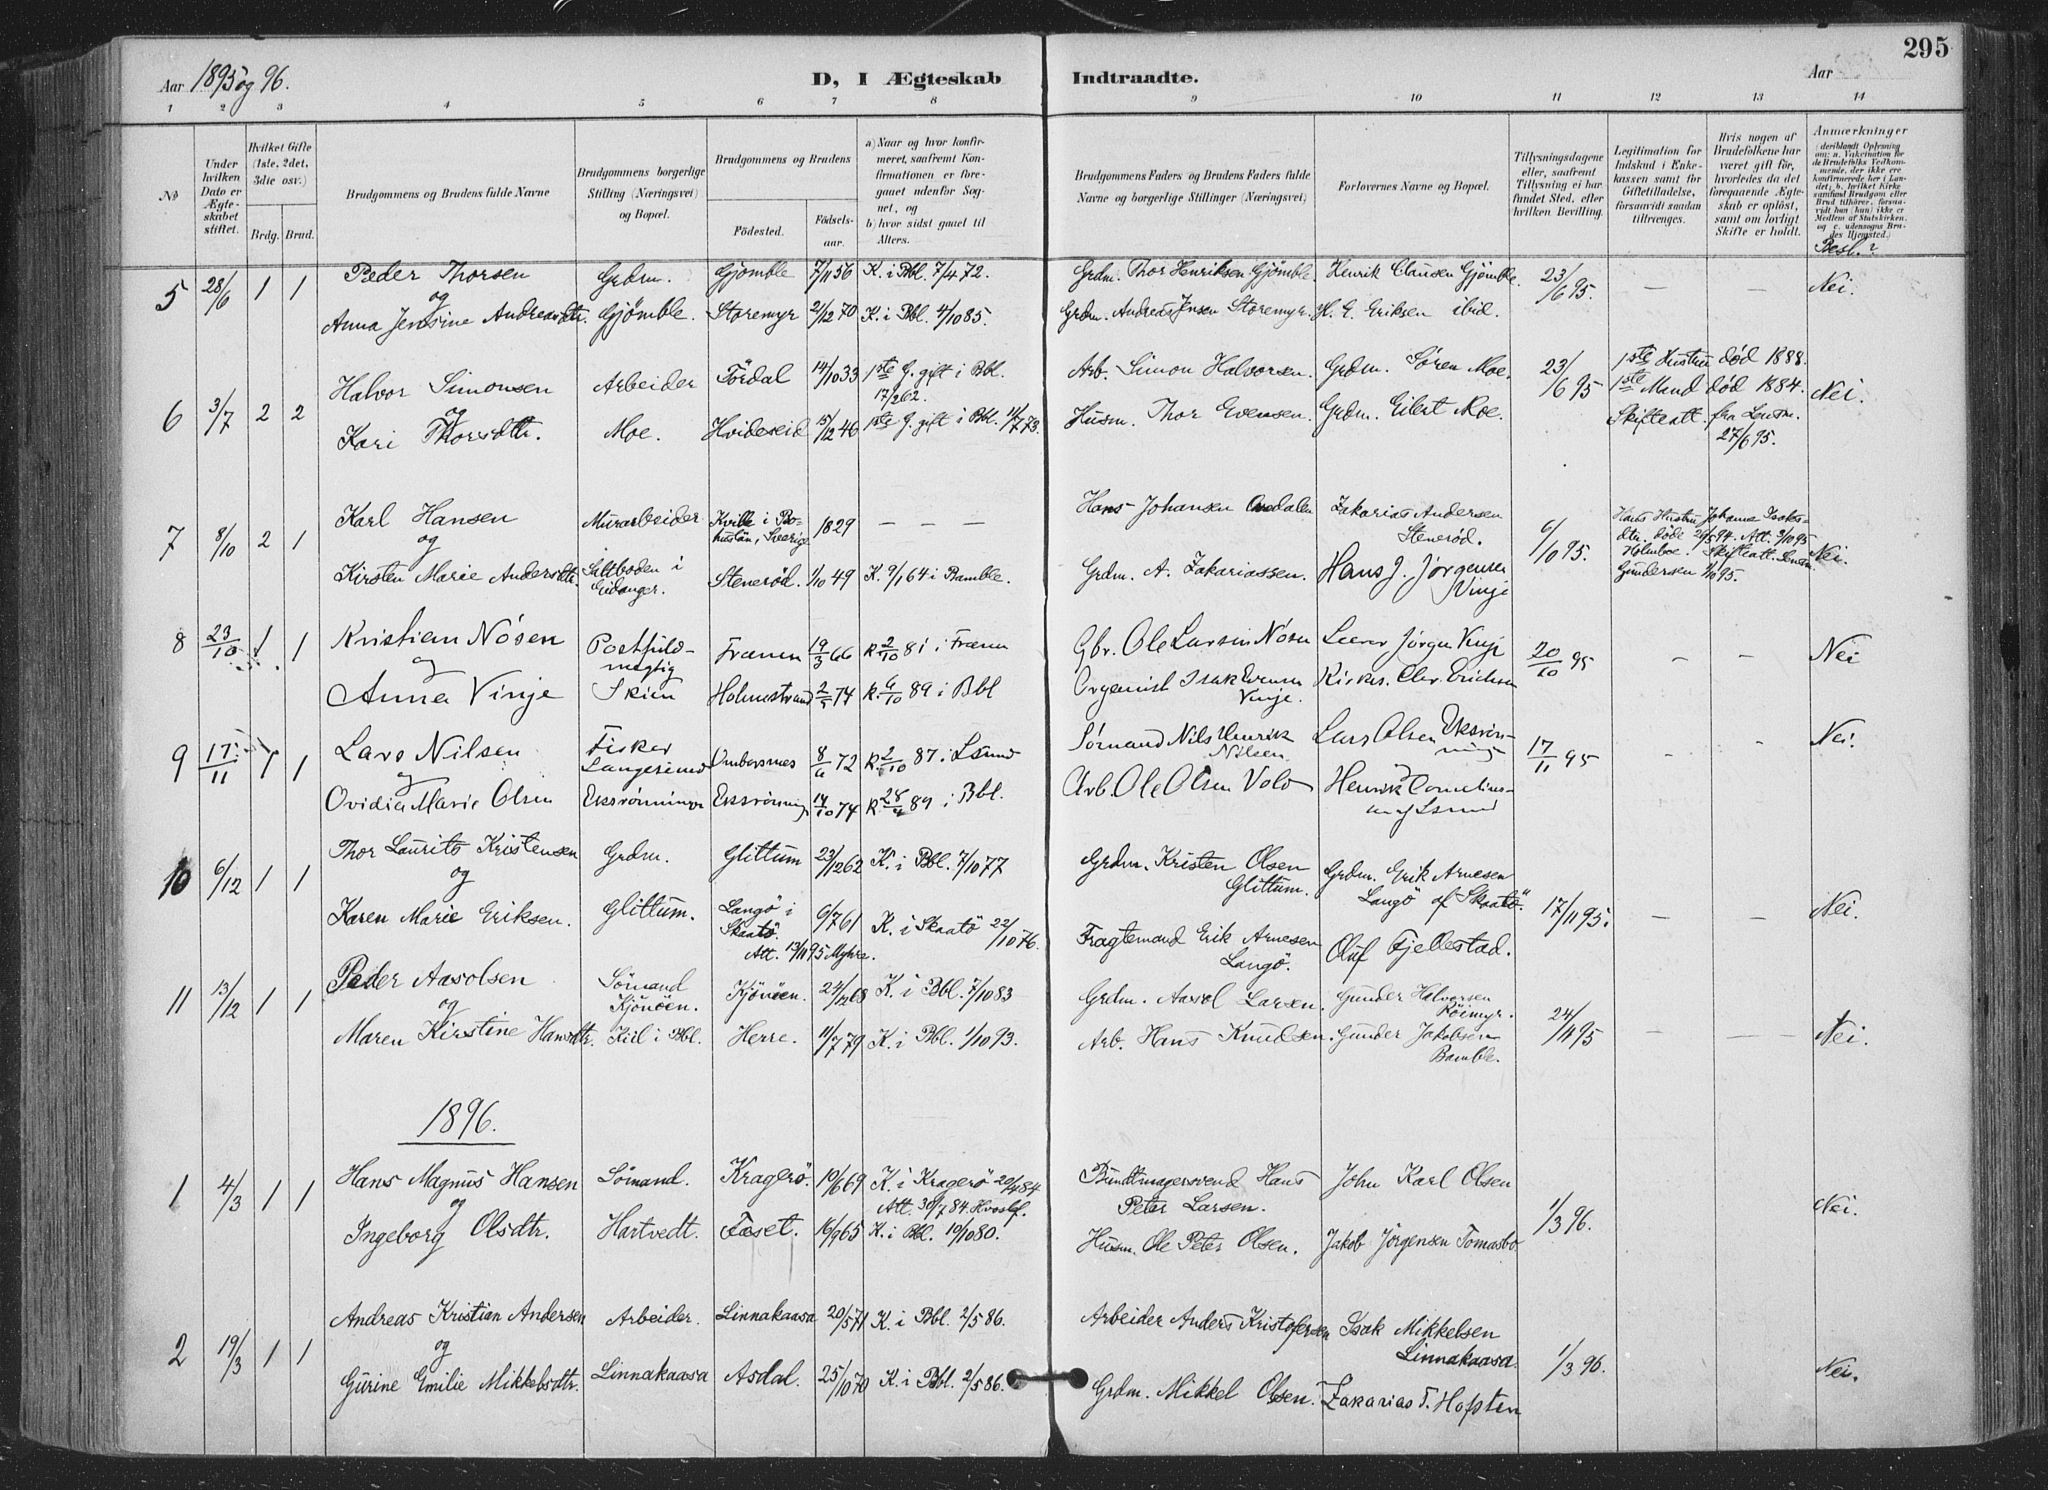 SAKO, Bamble kirkebøker, F/Fa/L0008: Ministerialbok nr. I 8, 1888-1900, s. 295